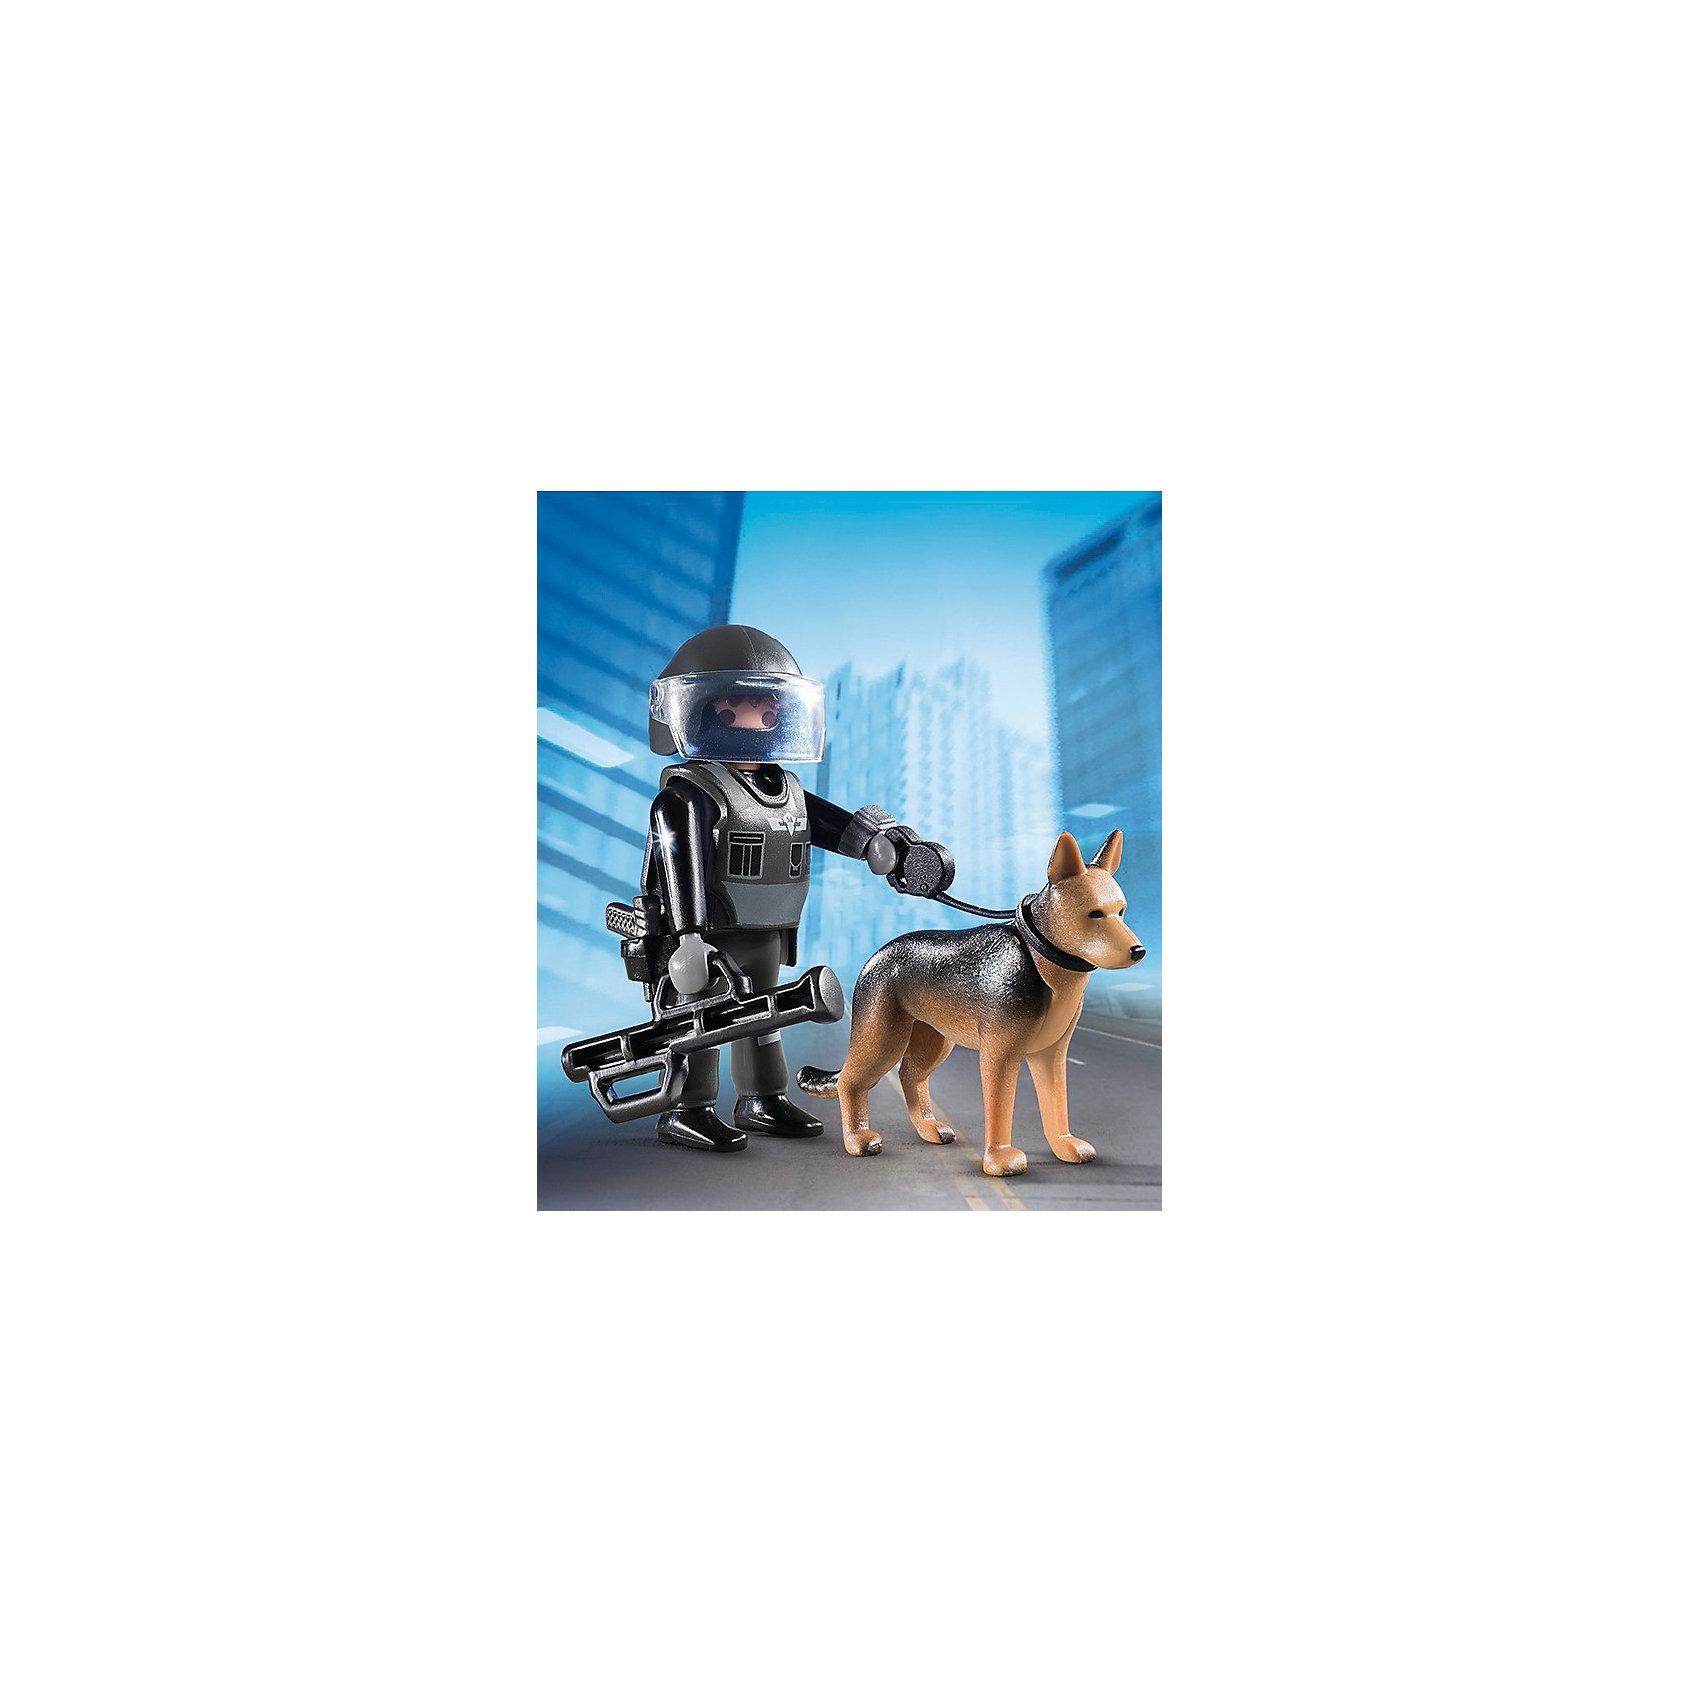 PLAYMOBIL® Экстра-набор: Полицейский спецназовец с собакой, PLAYMOBIL playmobil® экстра набор фея с оленем playmobil